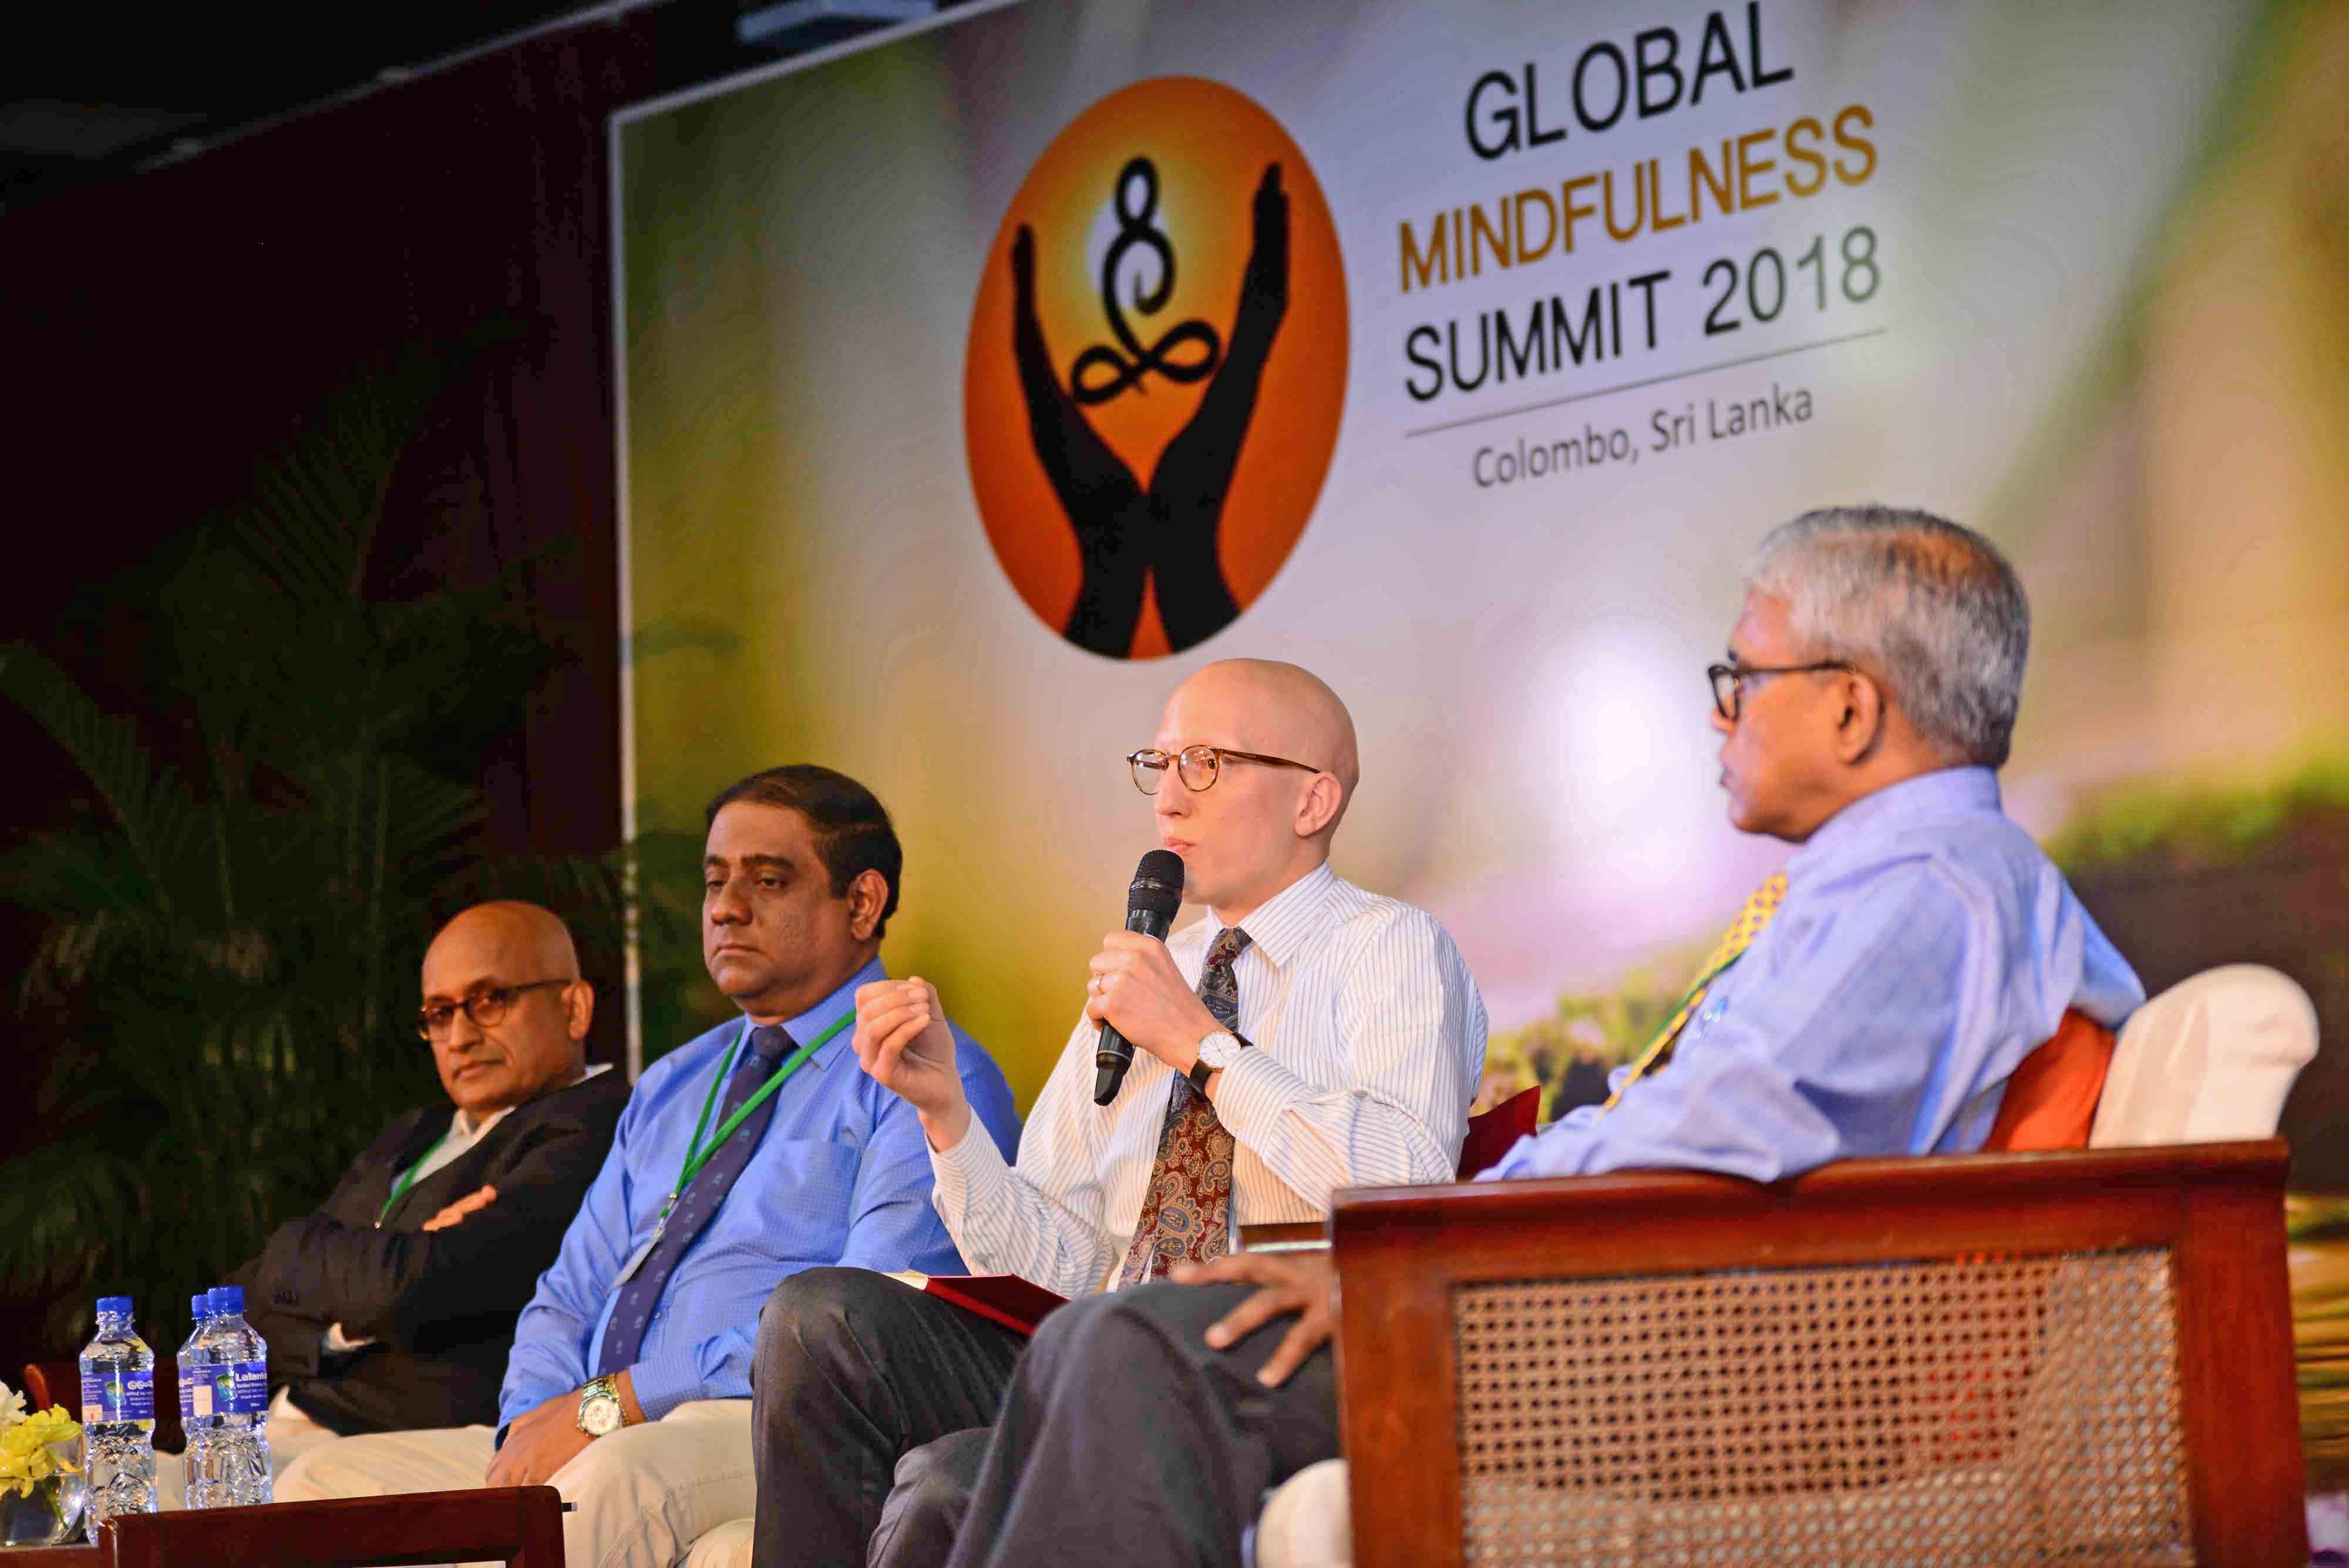 Global Mindfulness Summit 2018 - Day2 (32)